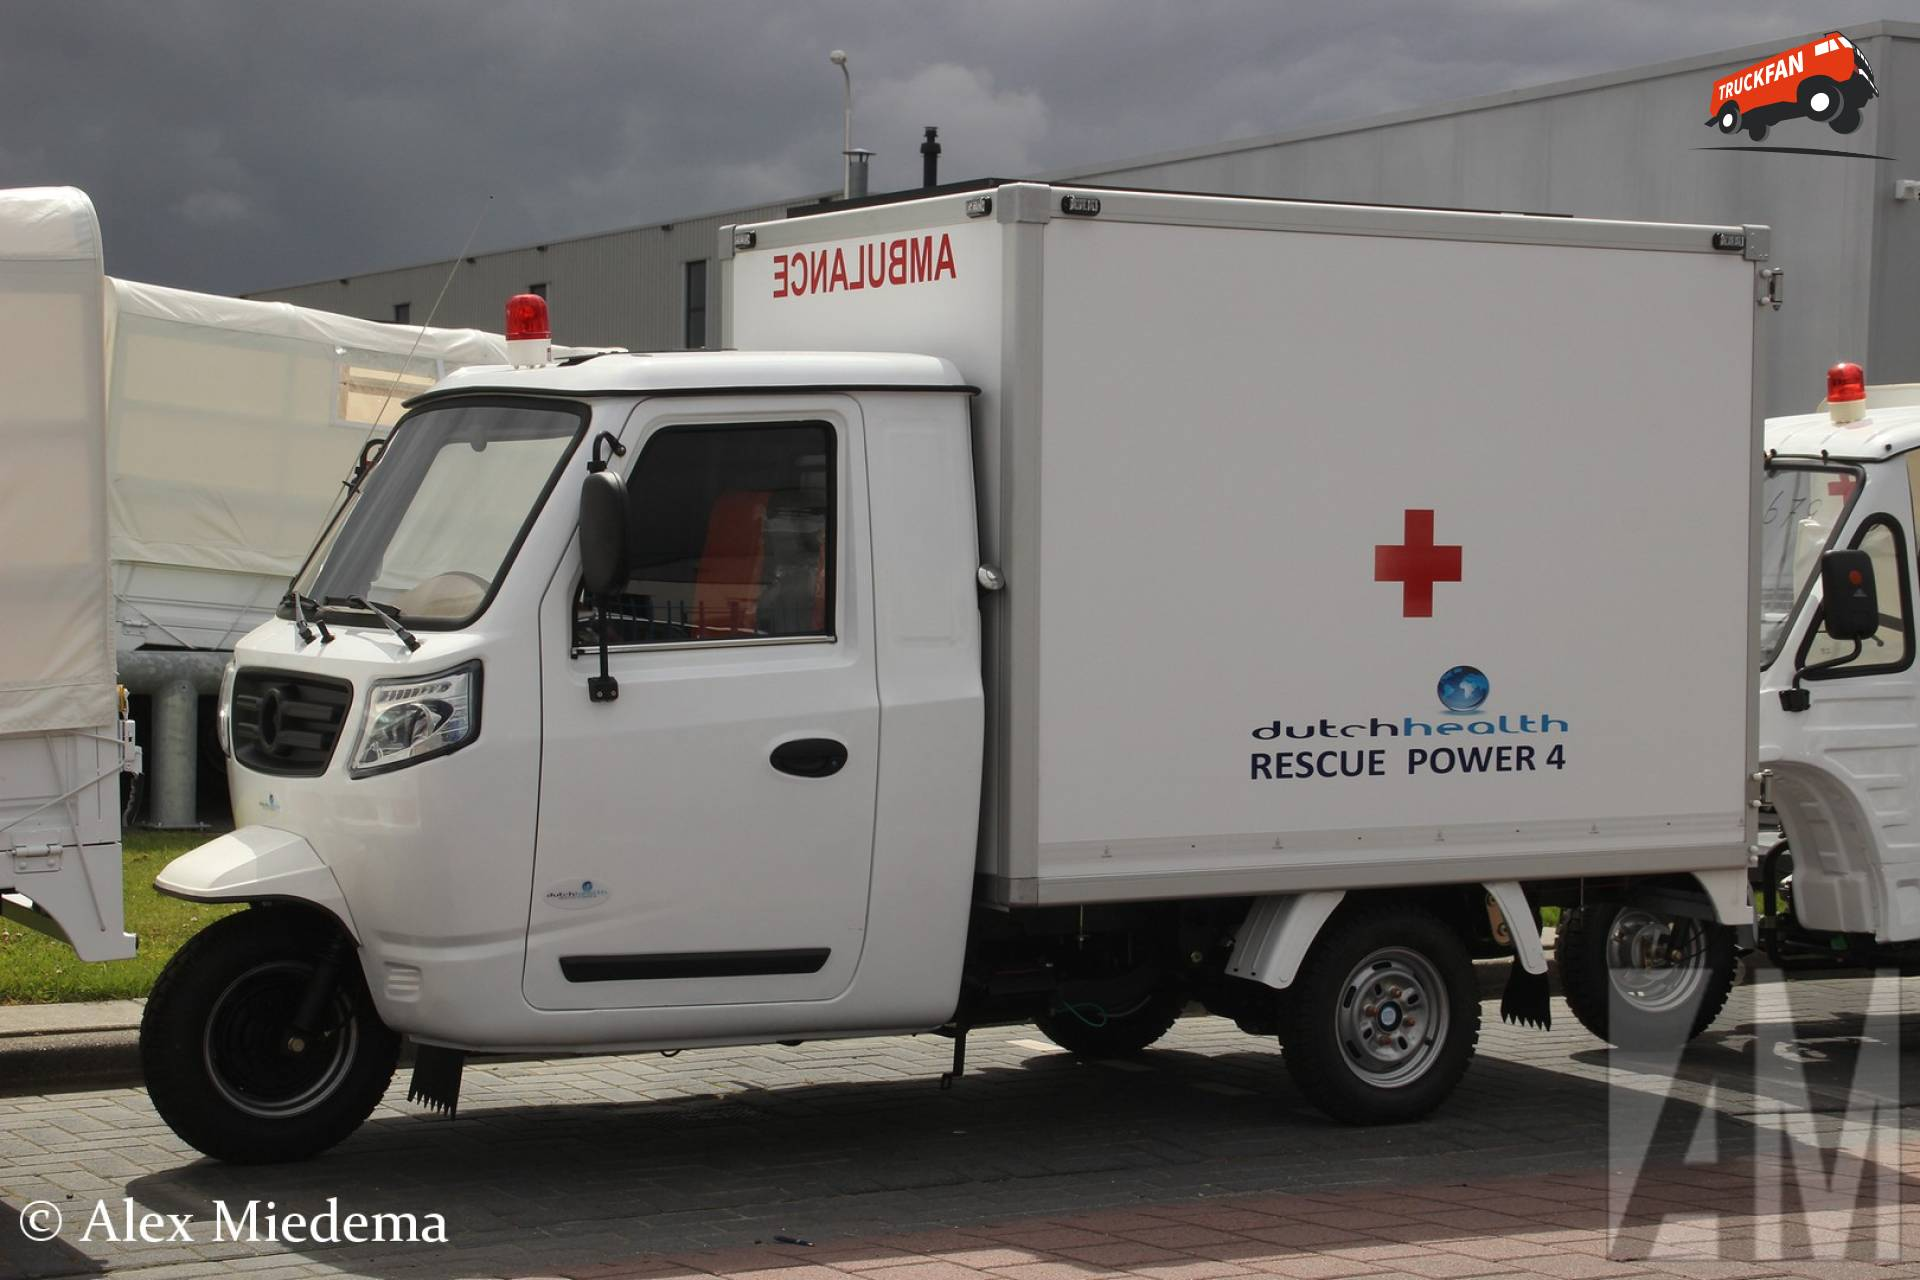 Dutch Health ambulance